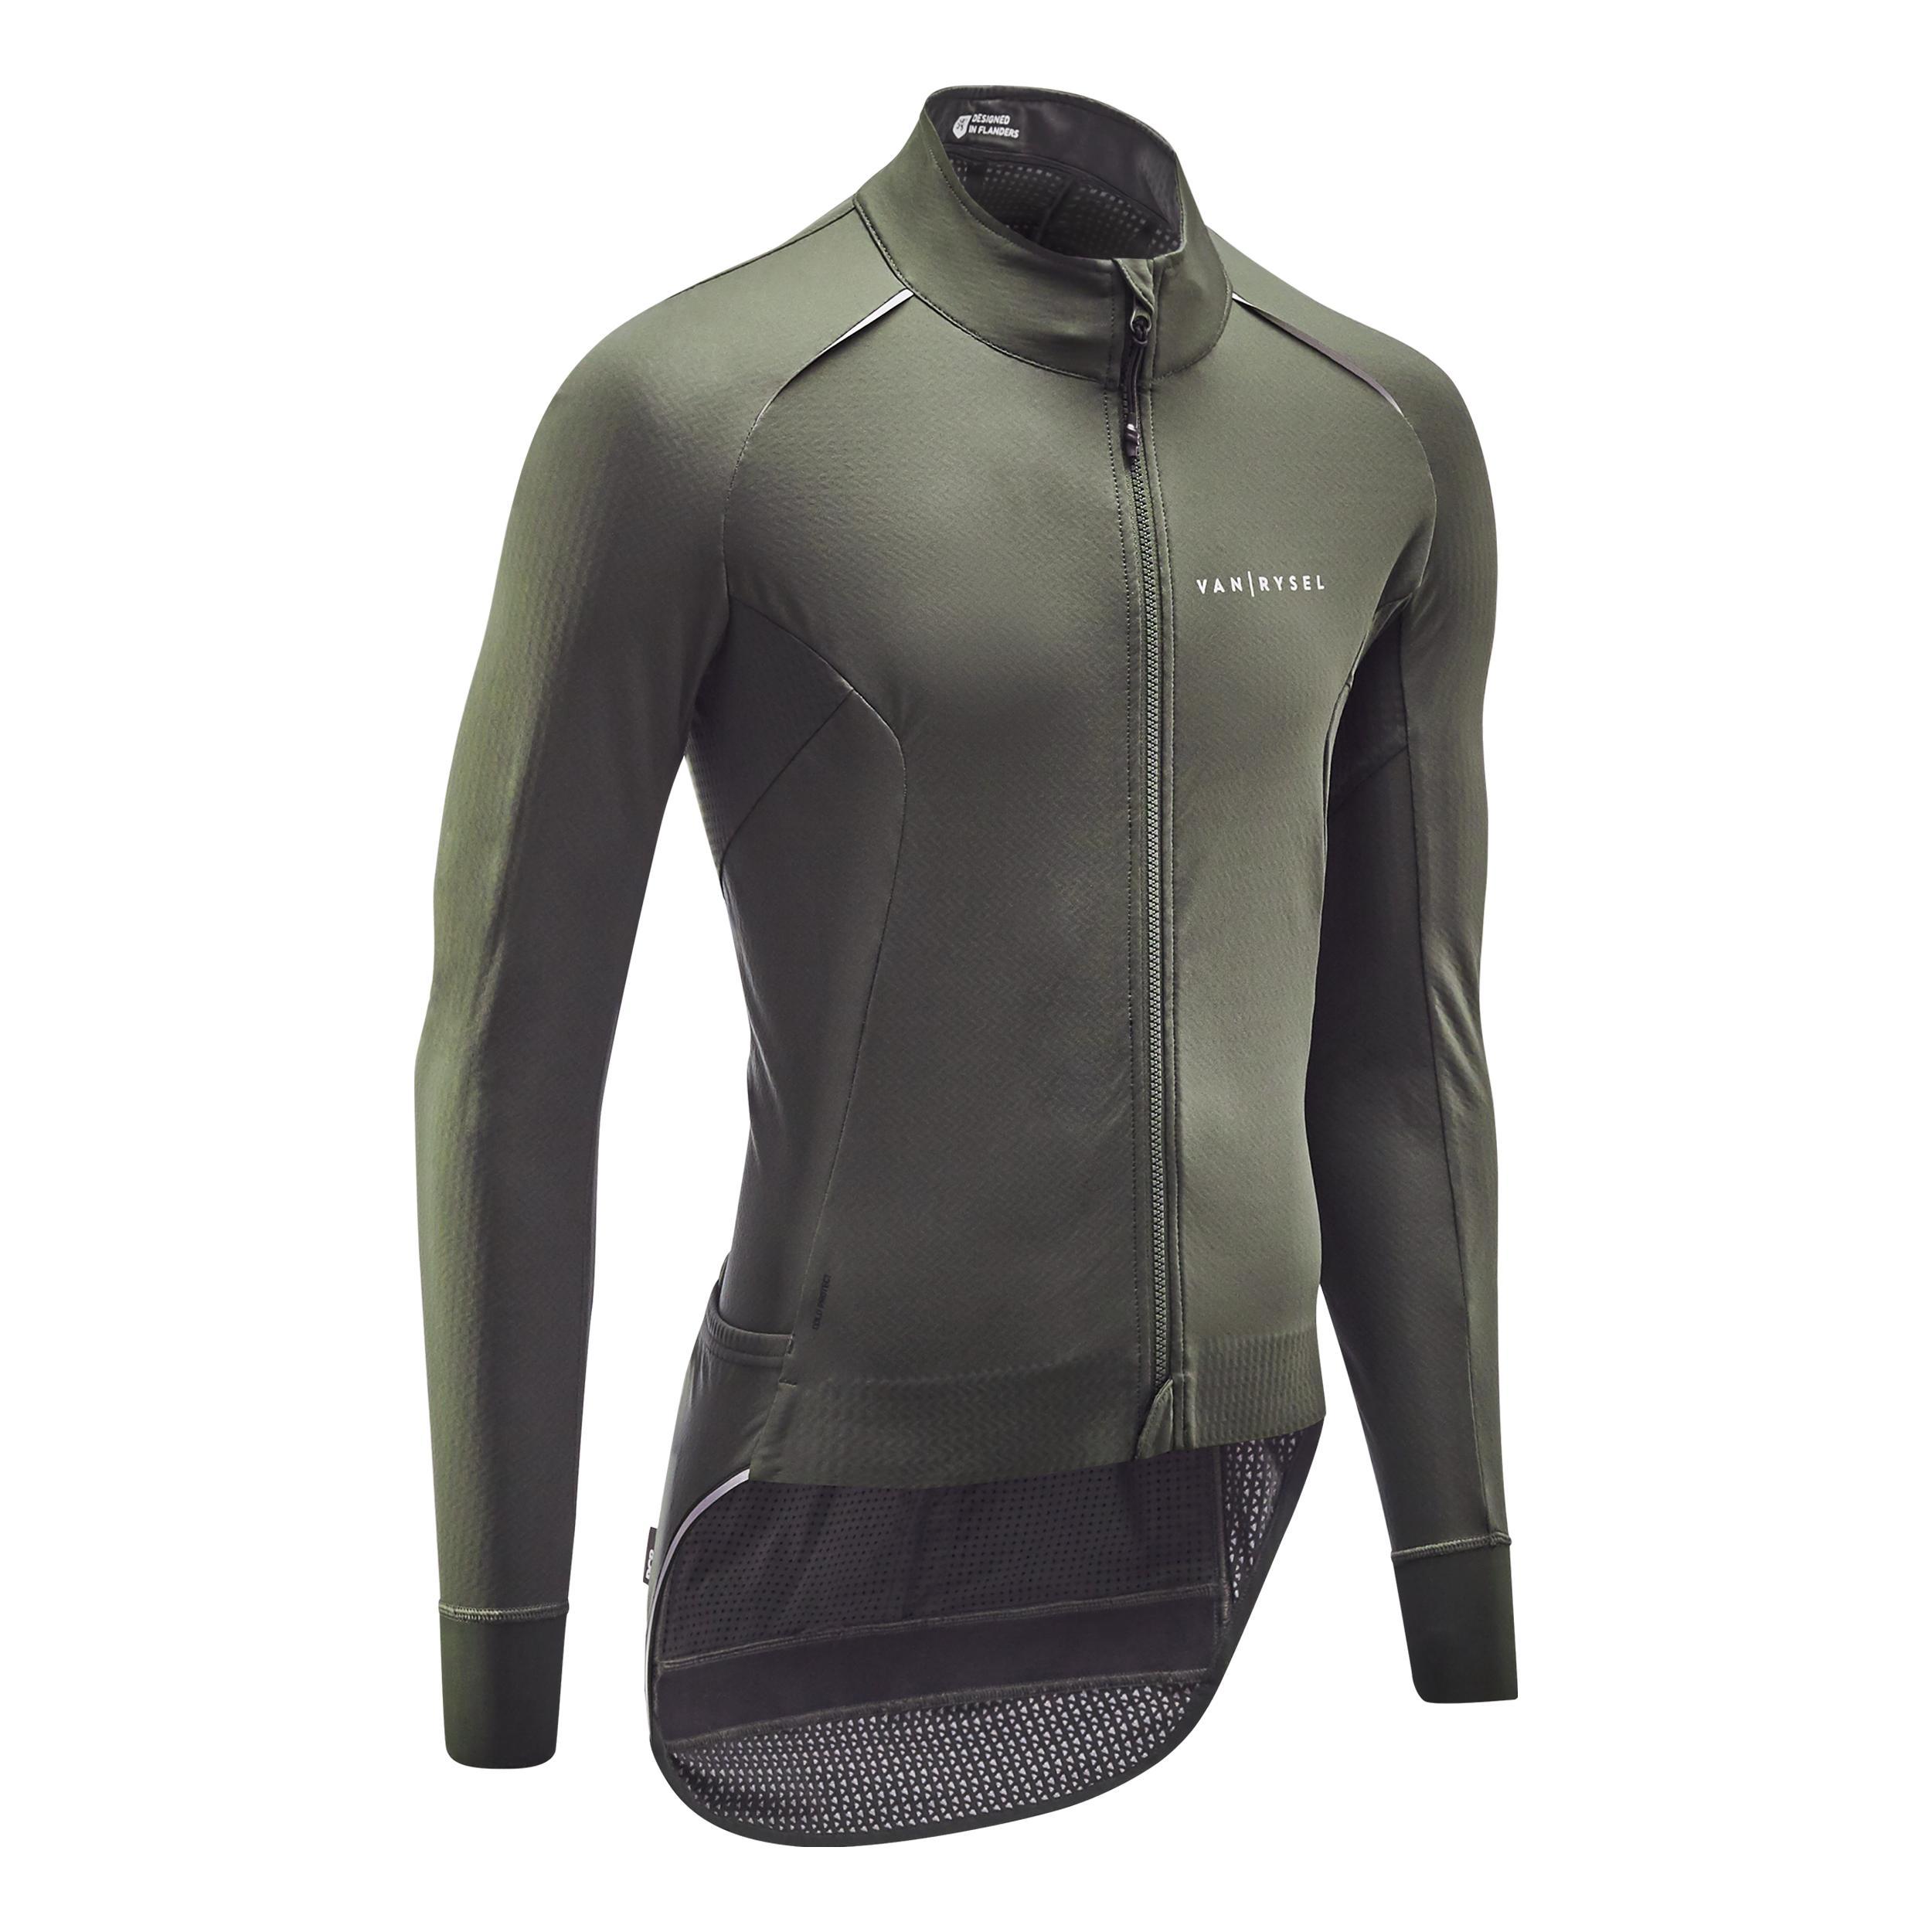 Jachetă ciclism RCR imagine produs